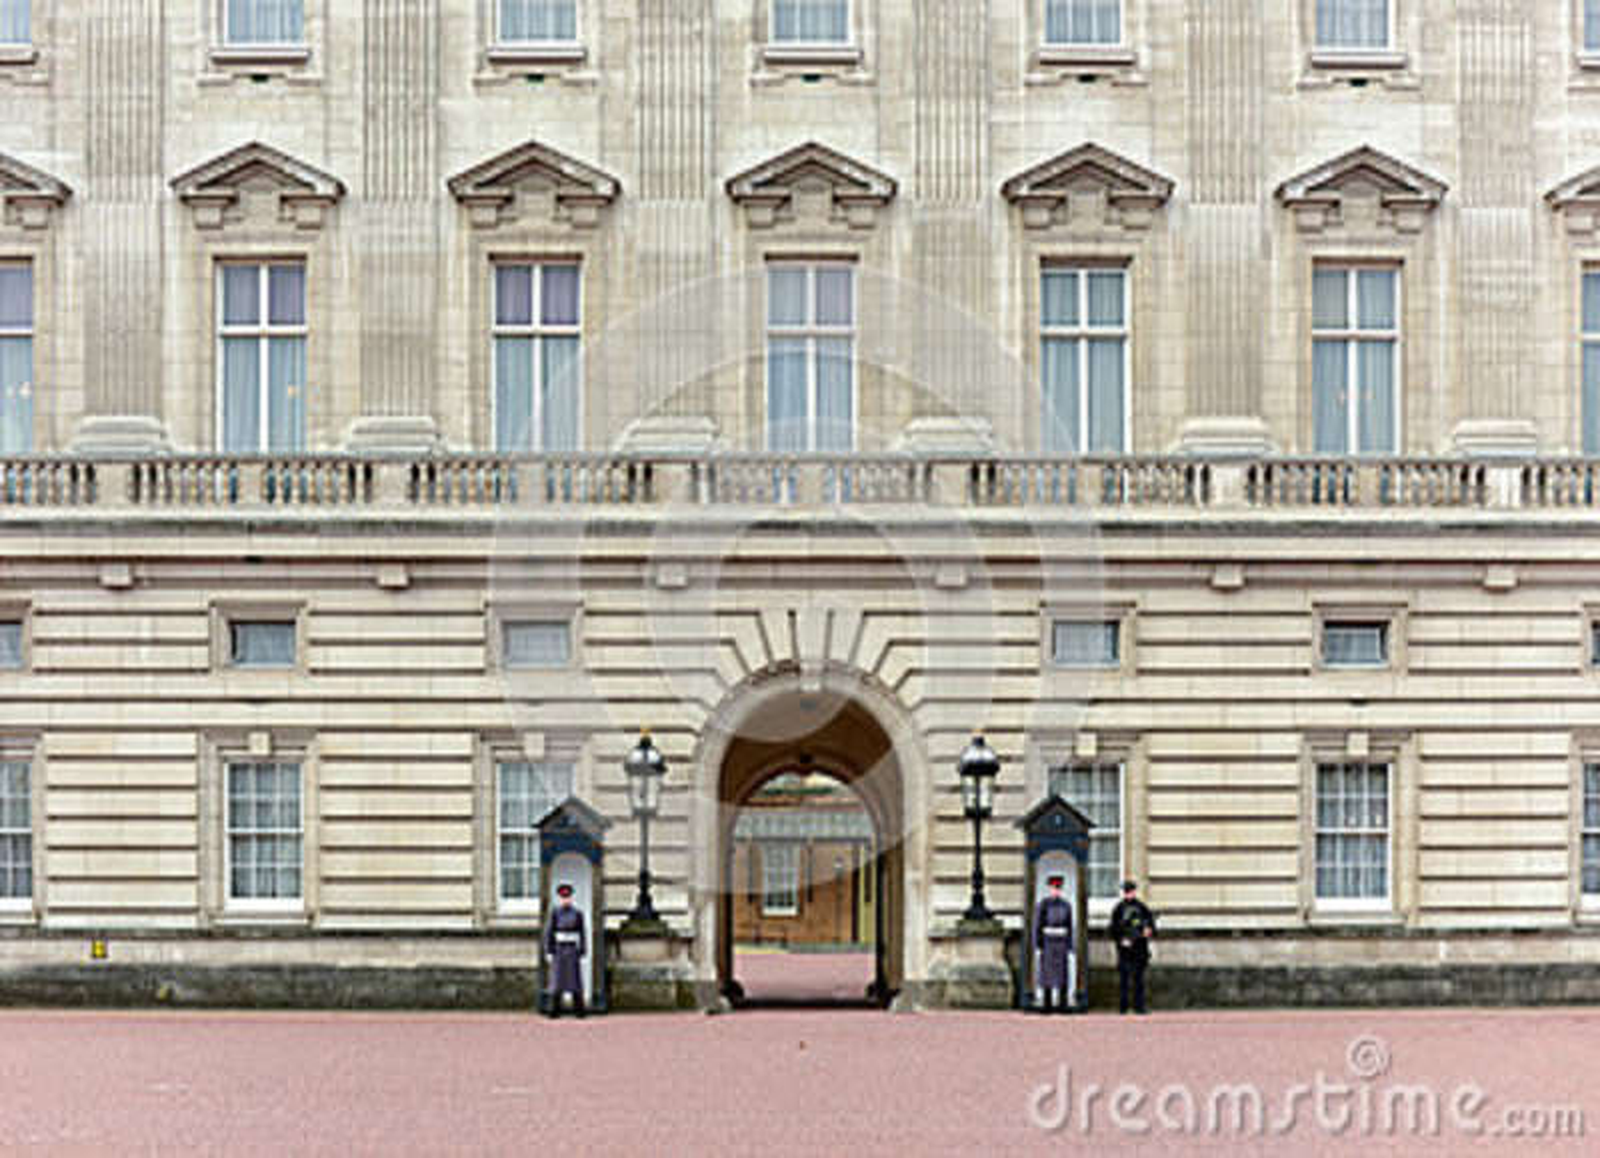 Sentry - Buckingham Palace, London